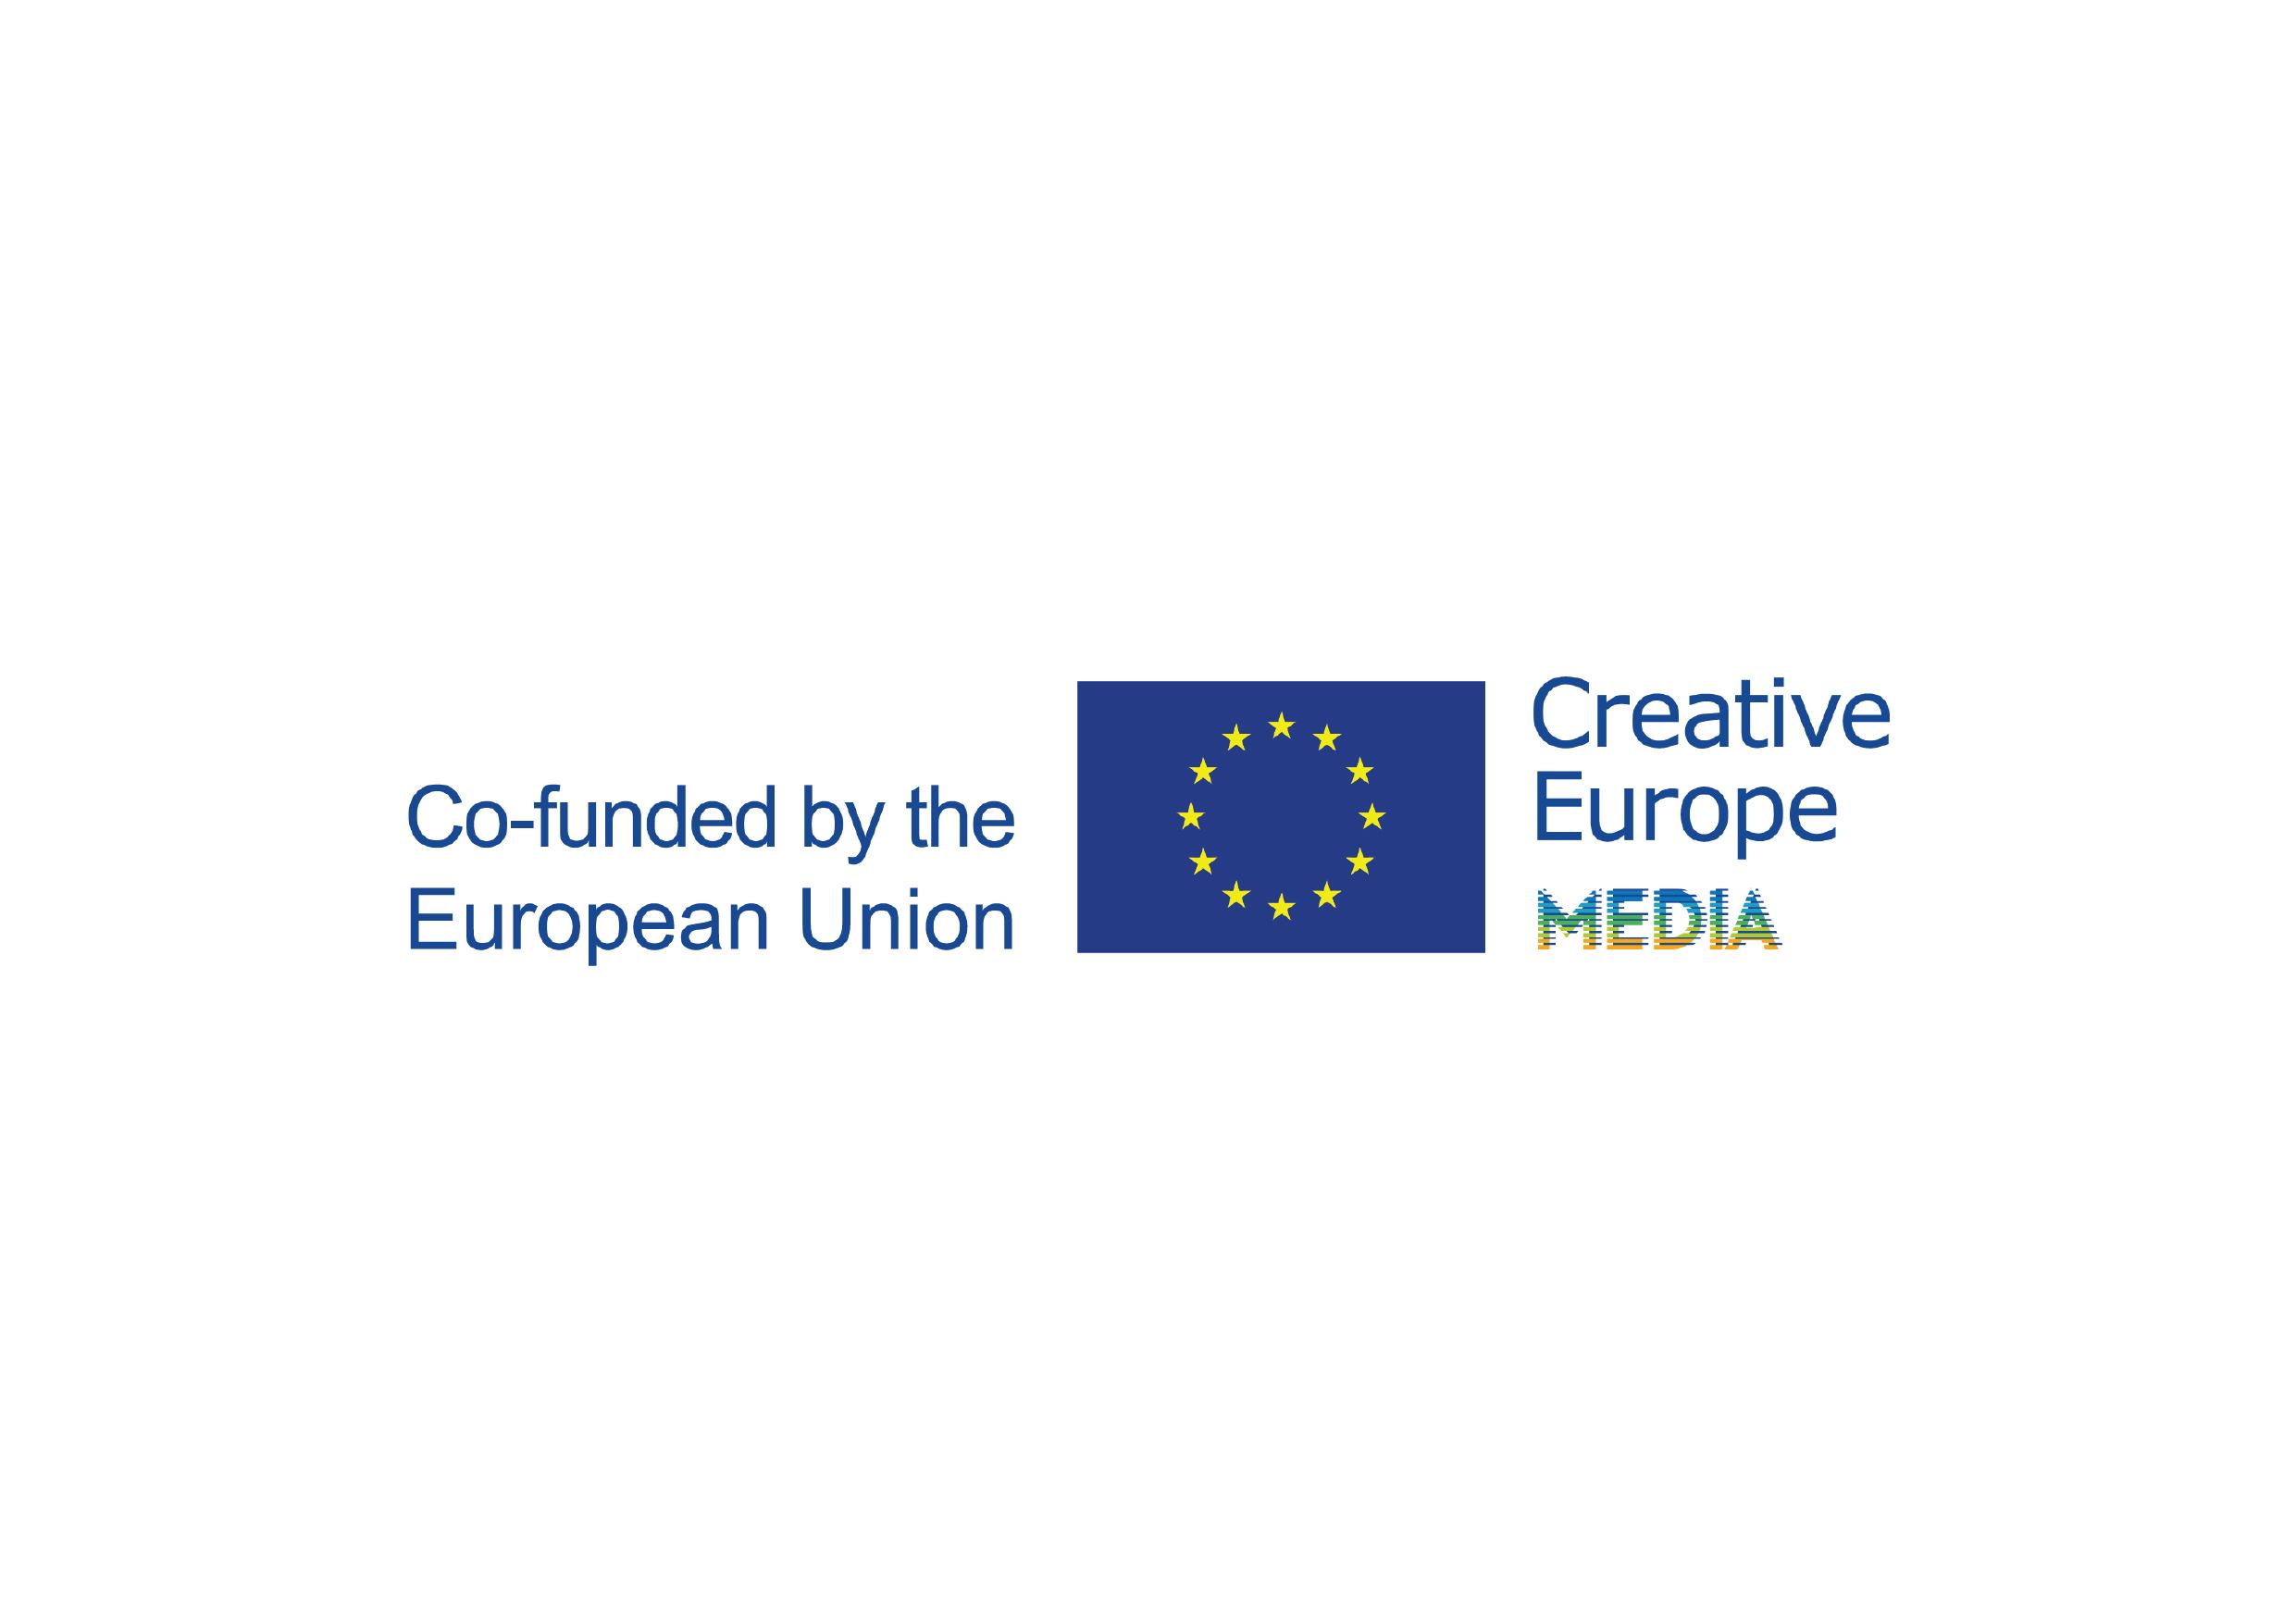 creative europe-01